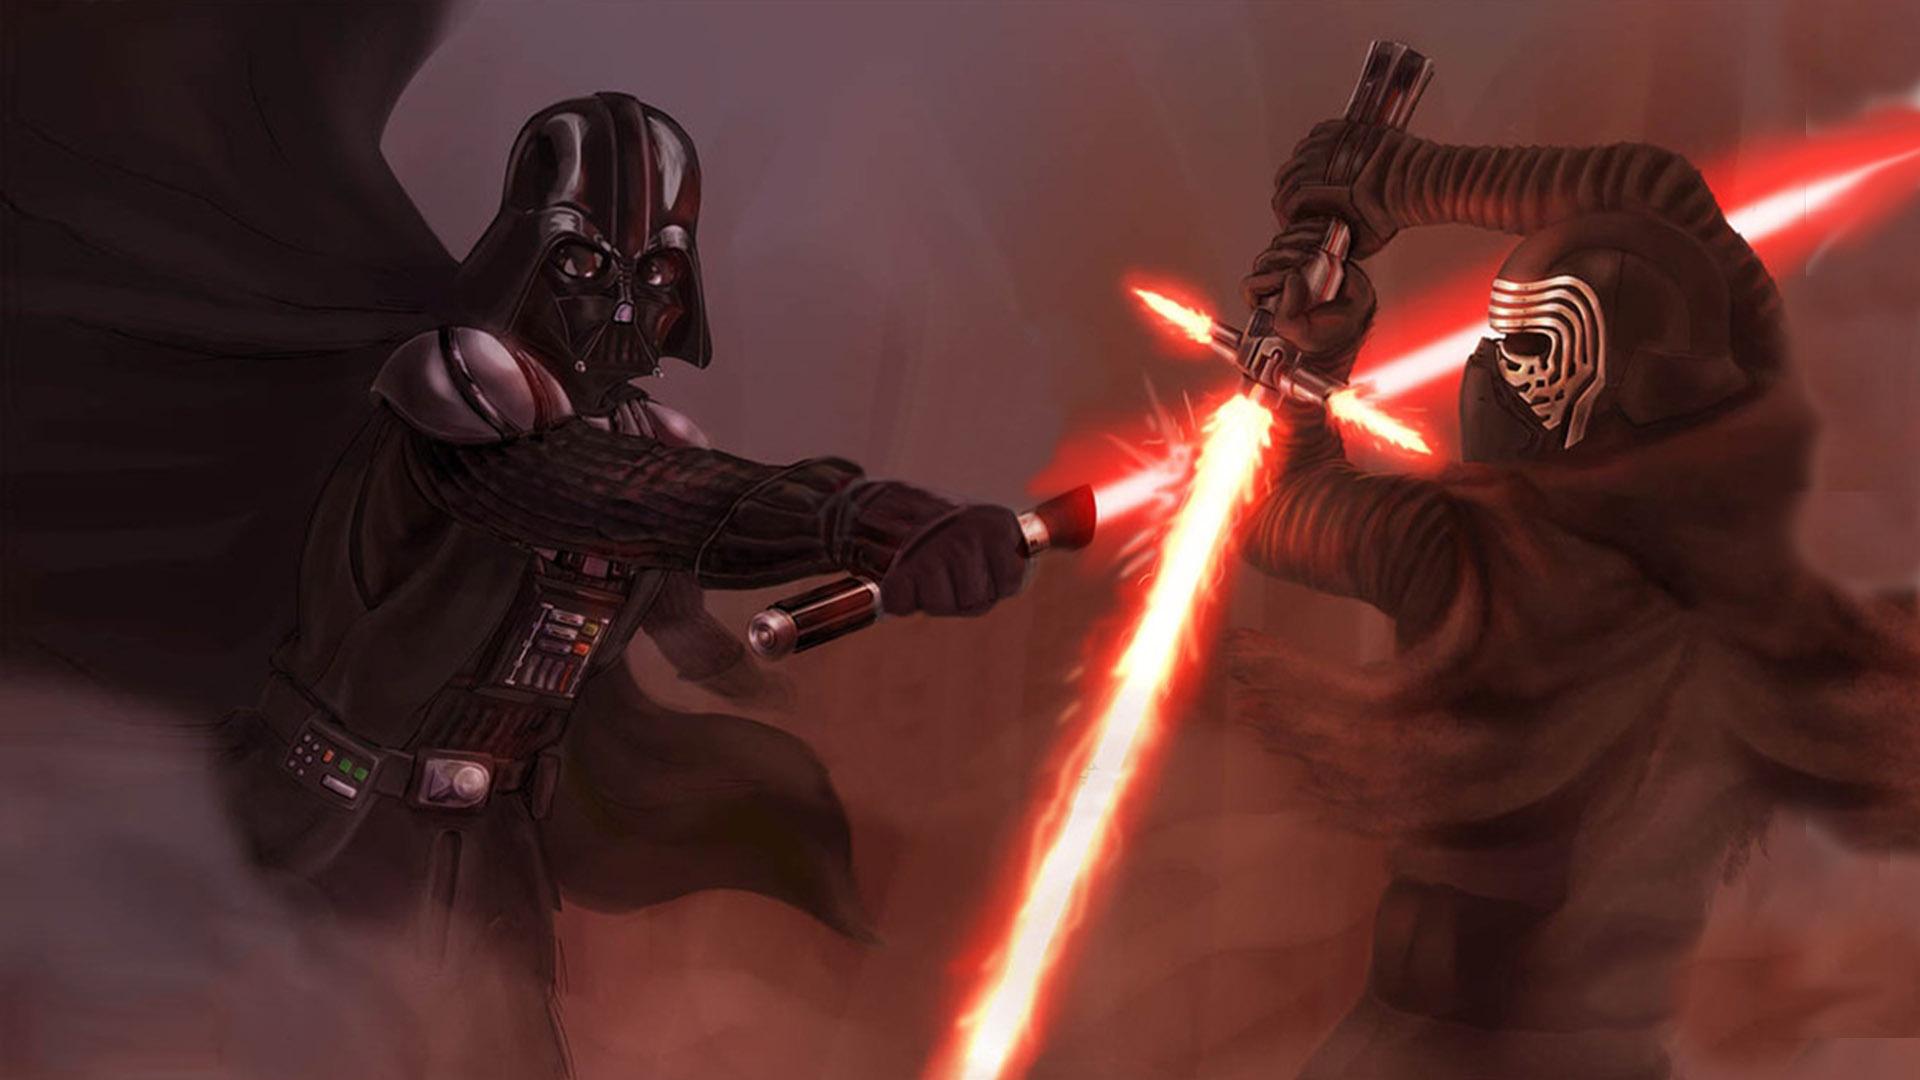 Vader Vs Kylo Ren Myconfinedspace